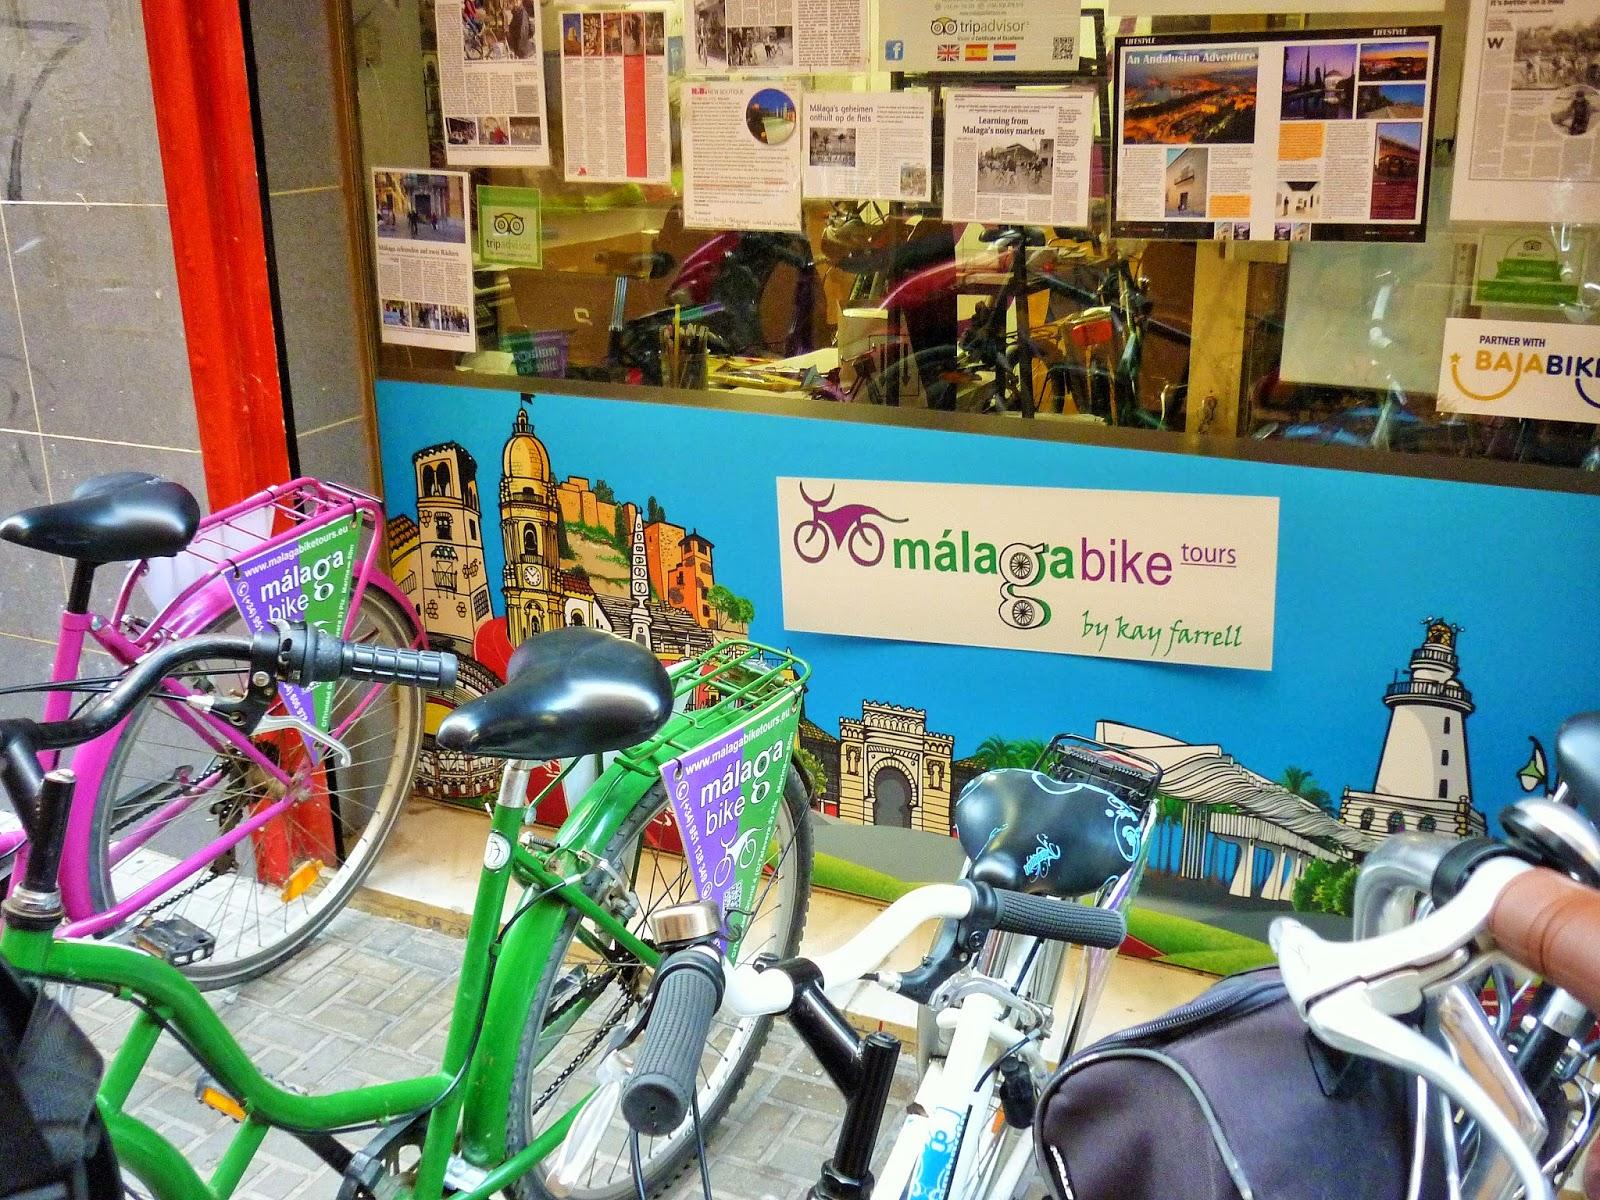 Malaga - Espagne - Malagabike - location de vélo